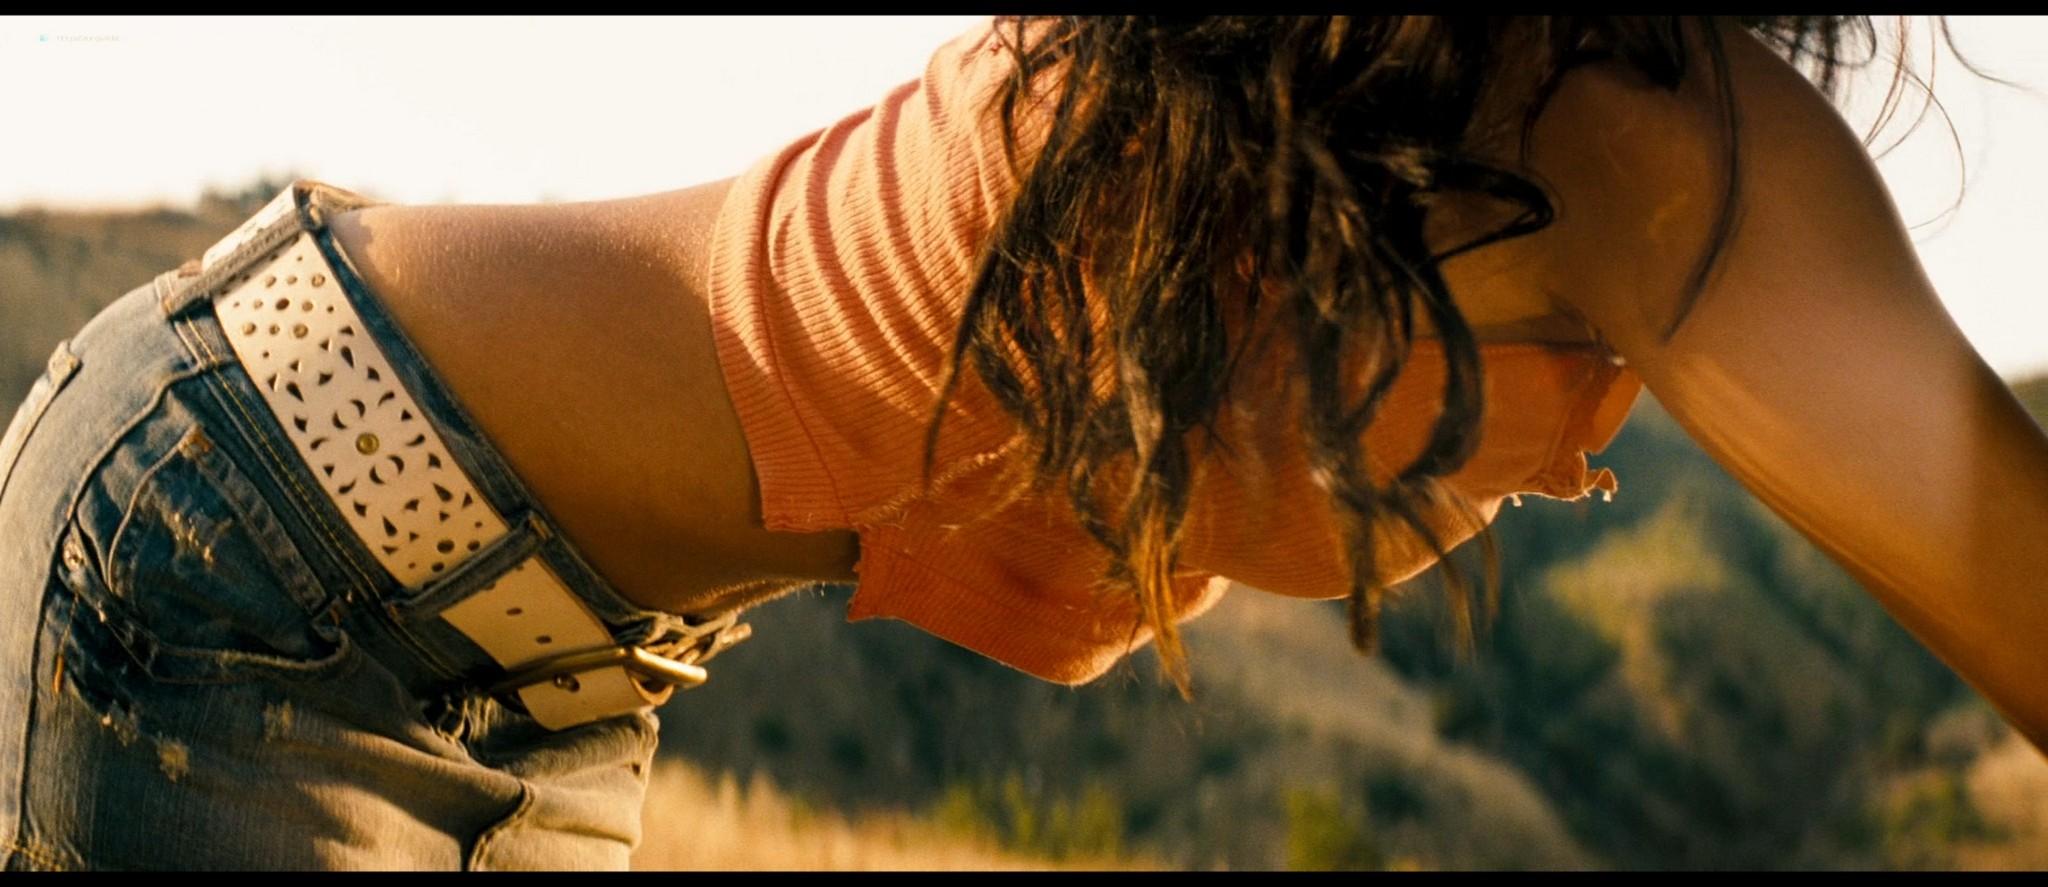 Megan Fox hot and sexy - Transformers (2007) HD 1080p BluRay Remux (13)